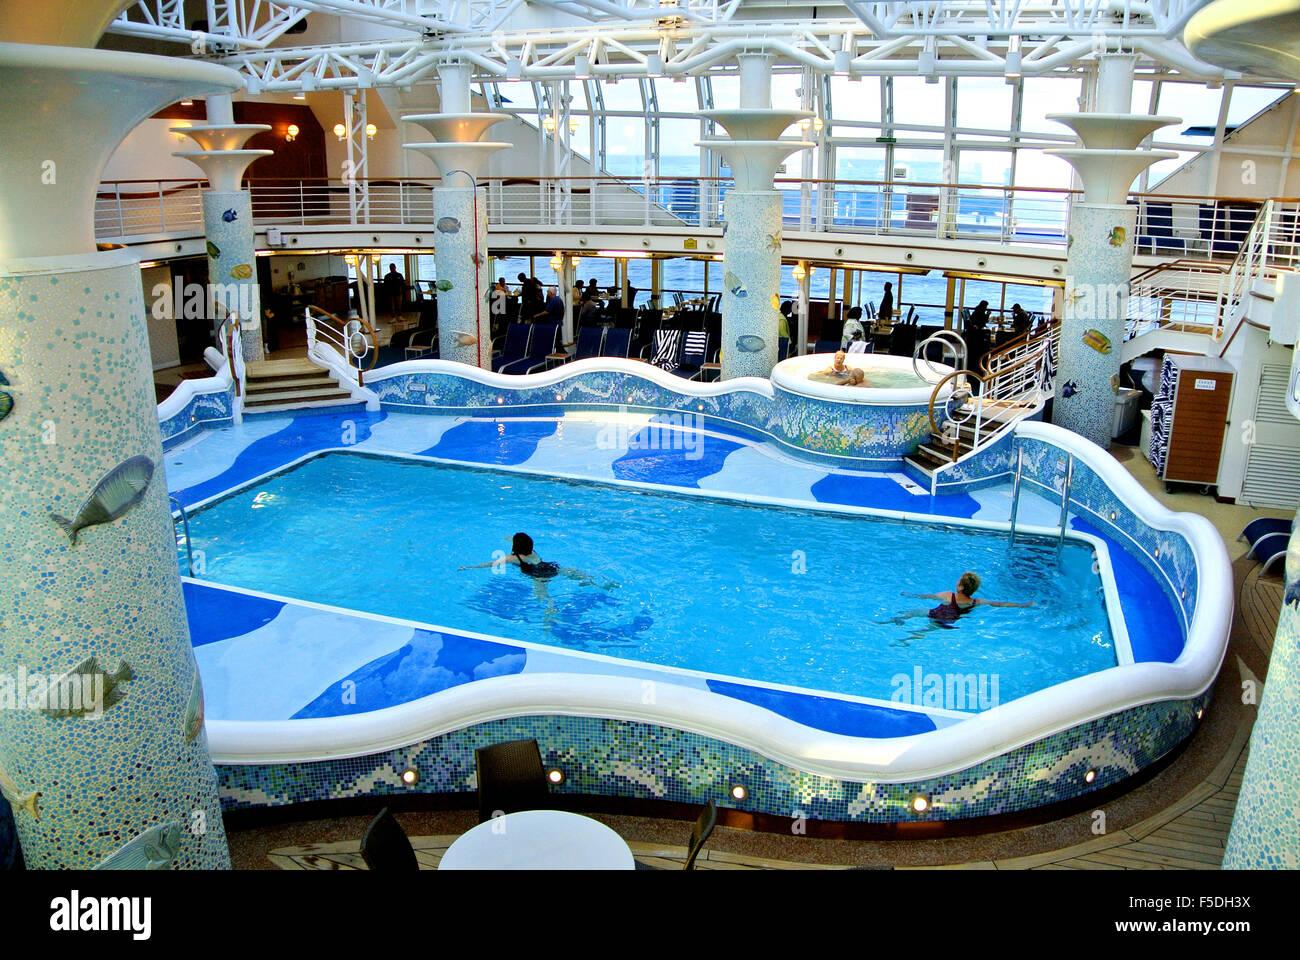 View Of Swimming Pool On Royal Princess Cruise Ship Stock Photo Royalty Free Image 89423934